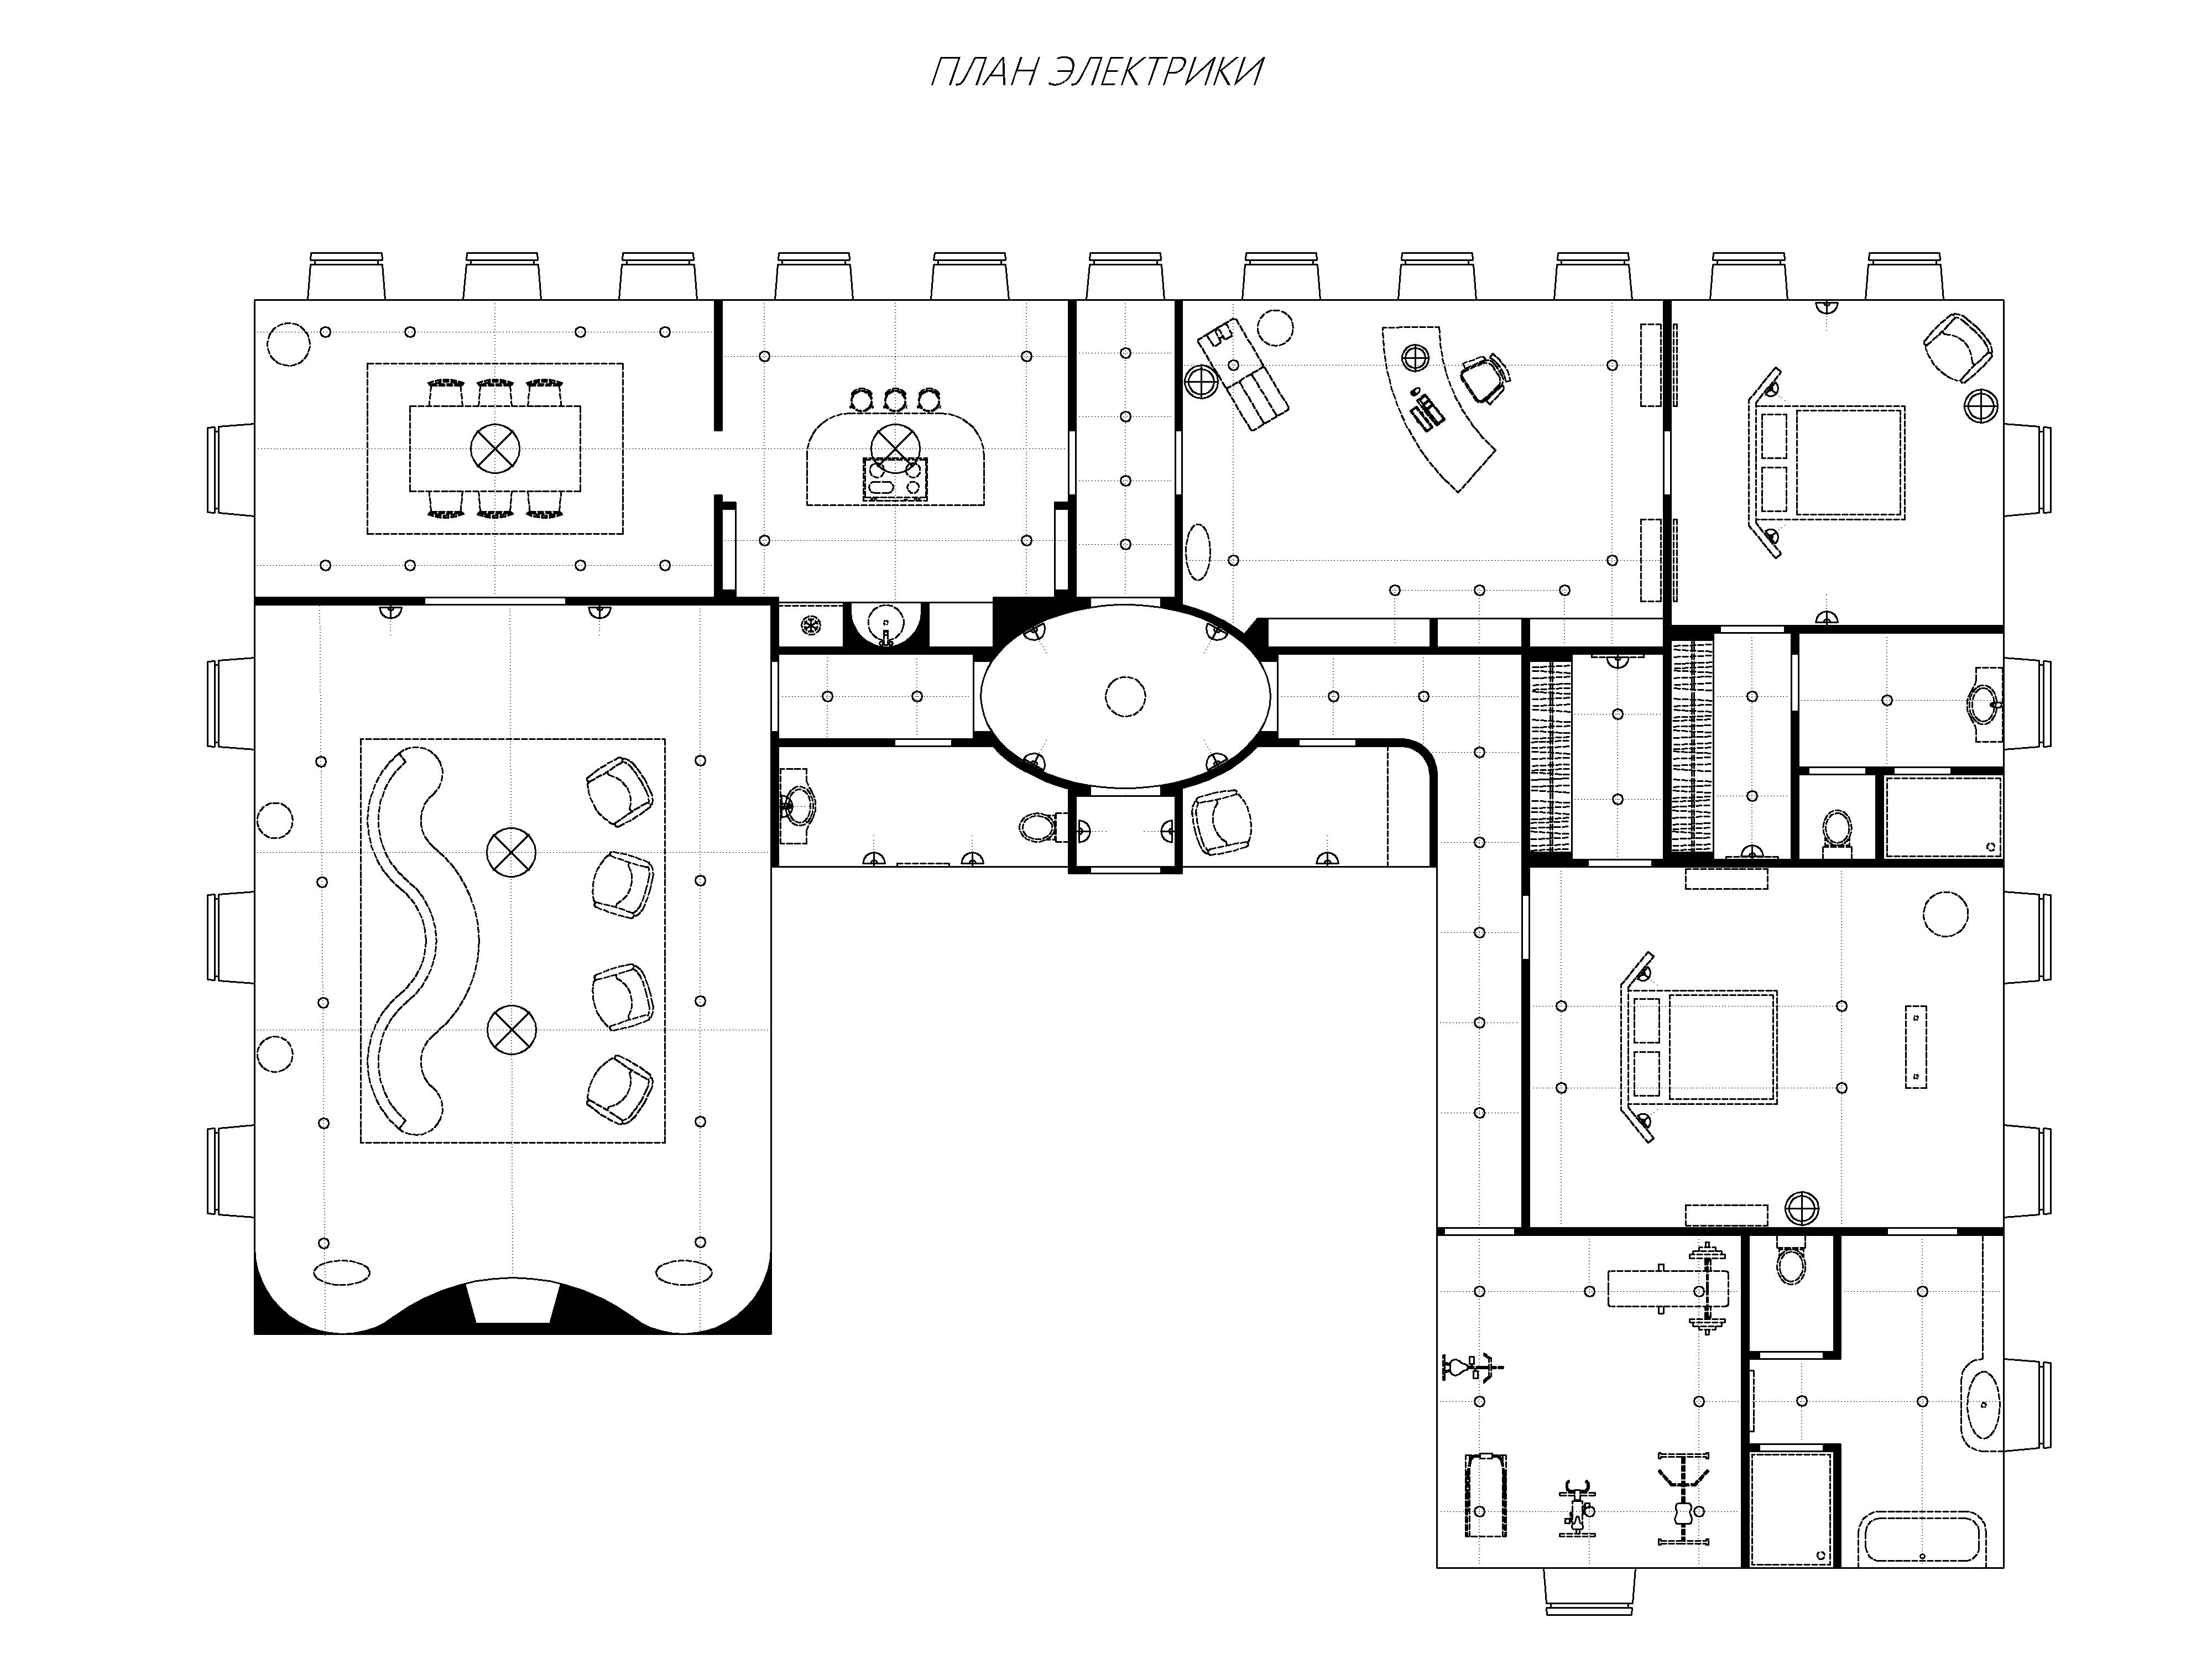 Чертеж по обмерам заказчика – план мебели и освещения квартира 325 кв.м.